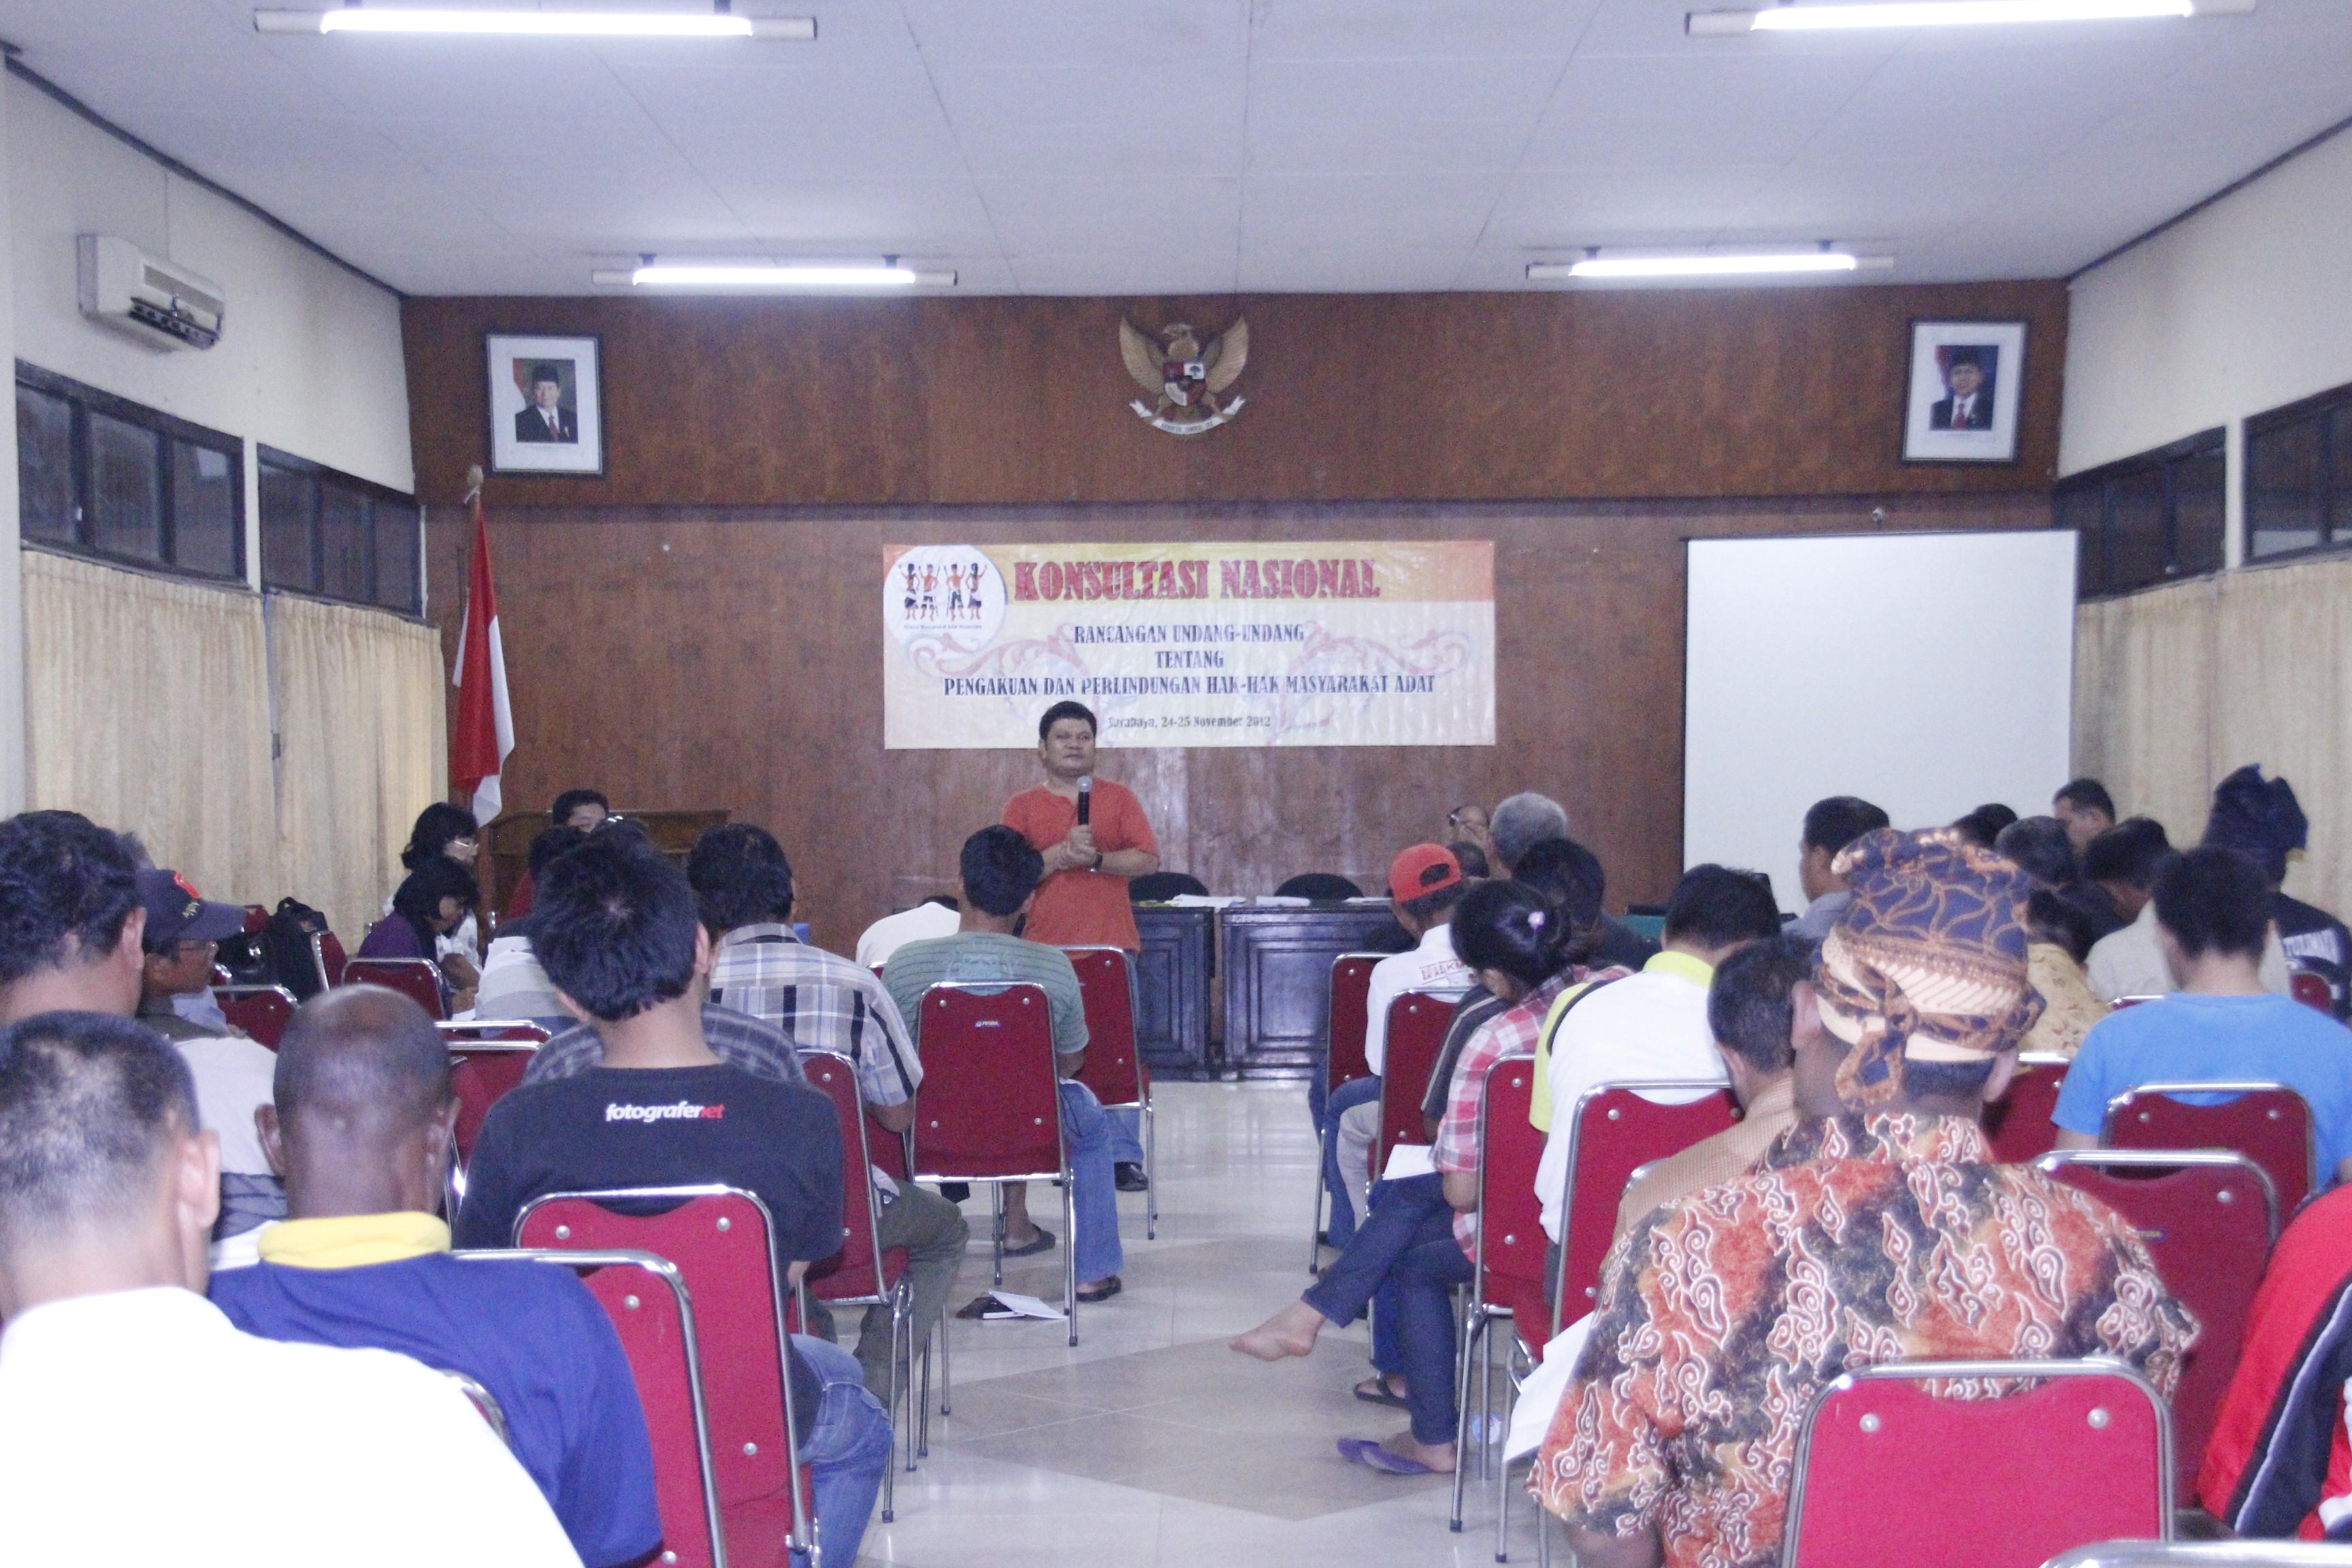 Konsultasi Nasional Rancangan Undang-Undang Pengakuan dan Perindungan Hak-Hak Masyarakat Adat